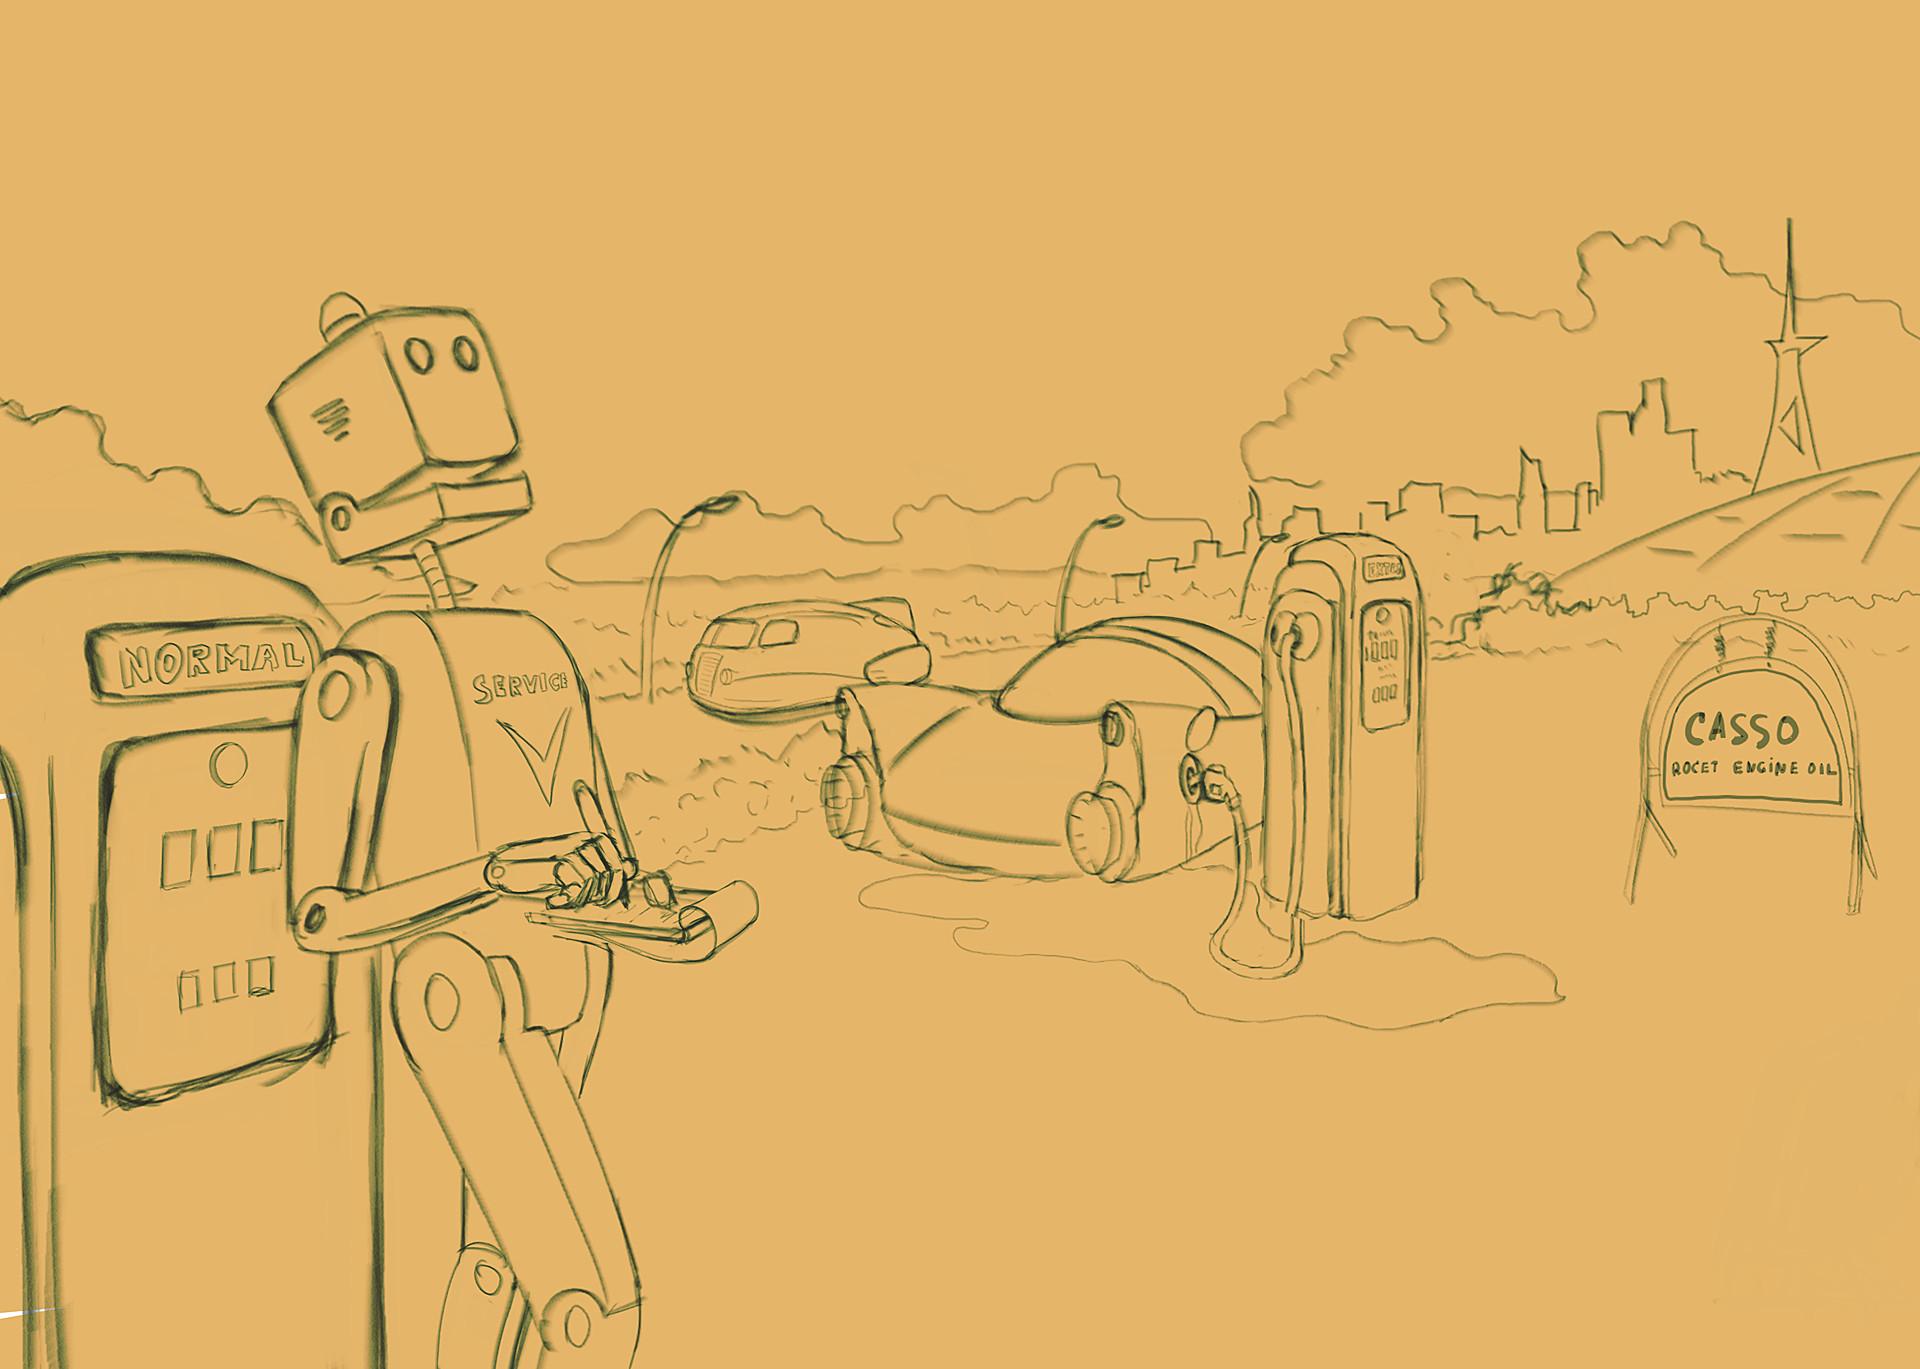 Dmytro bidnyak robot poet pencil